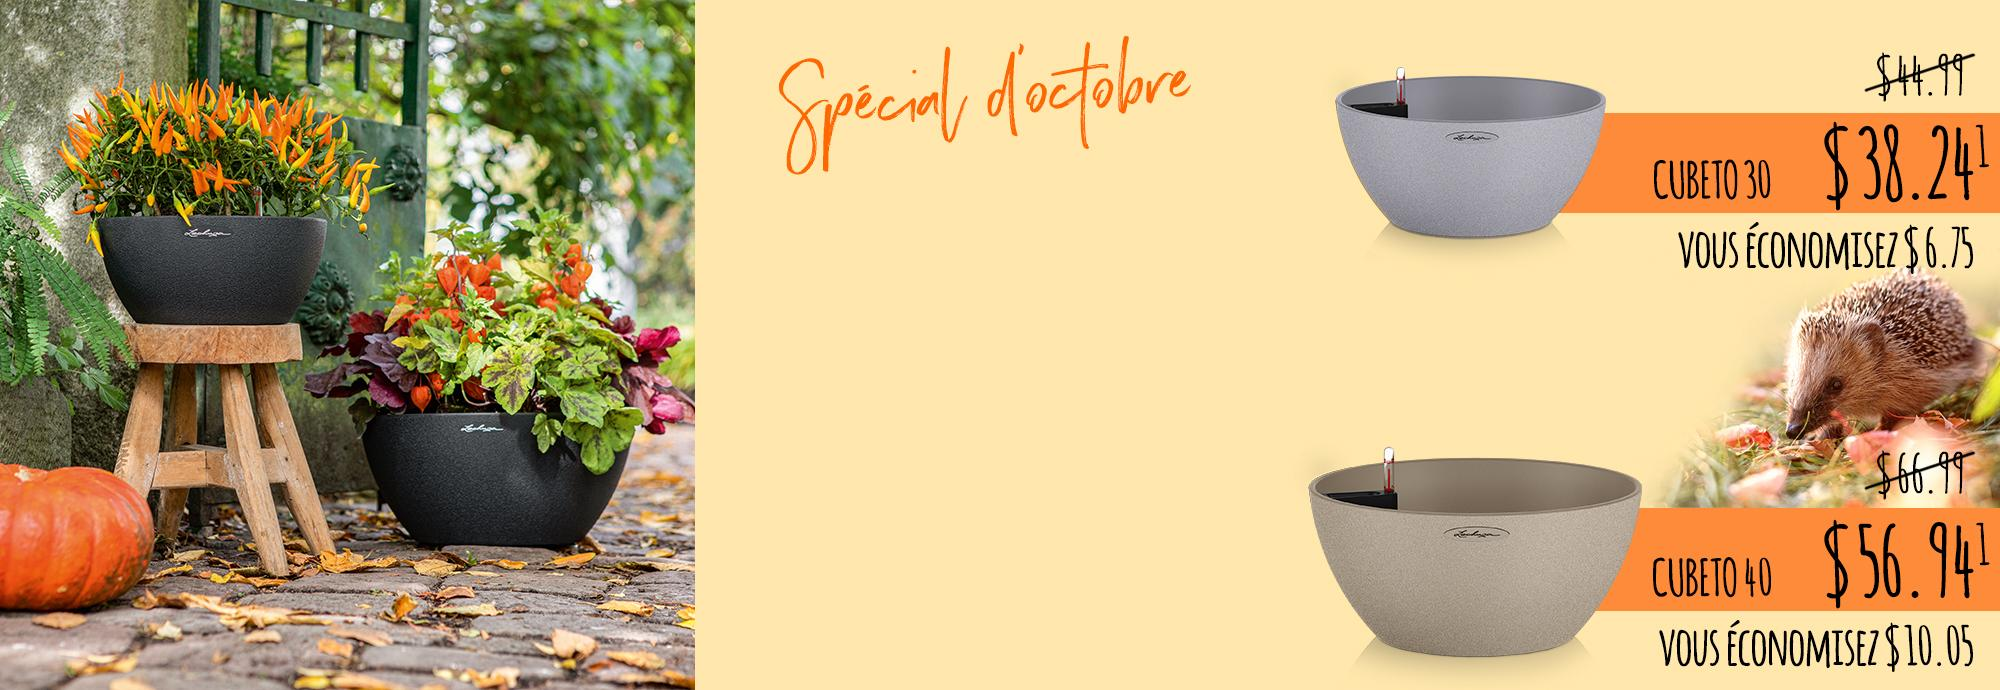 Spécial d'octobre: Creative Autumn Decoration with CUBETO Stone